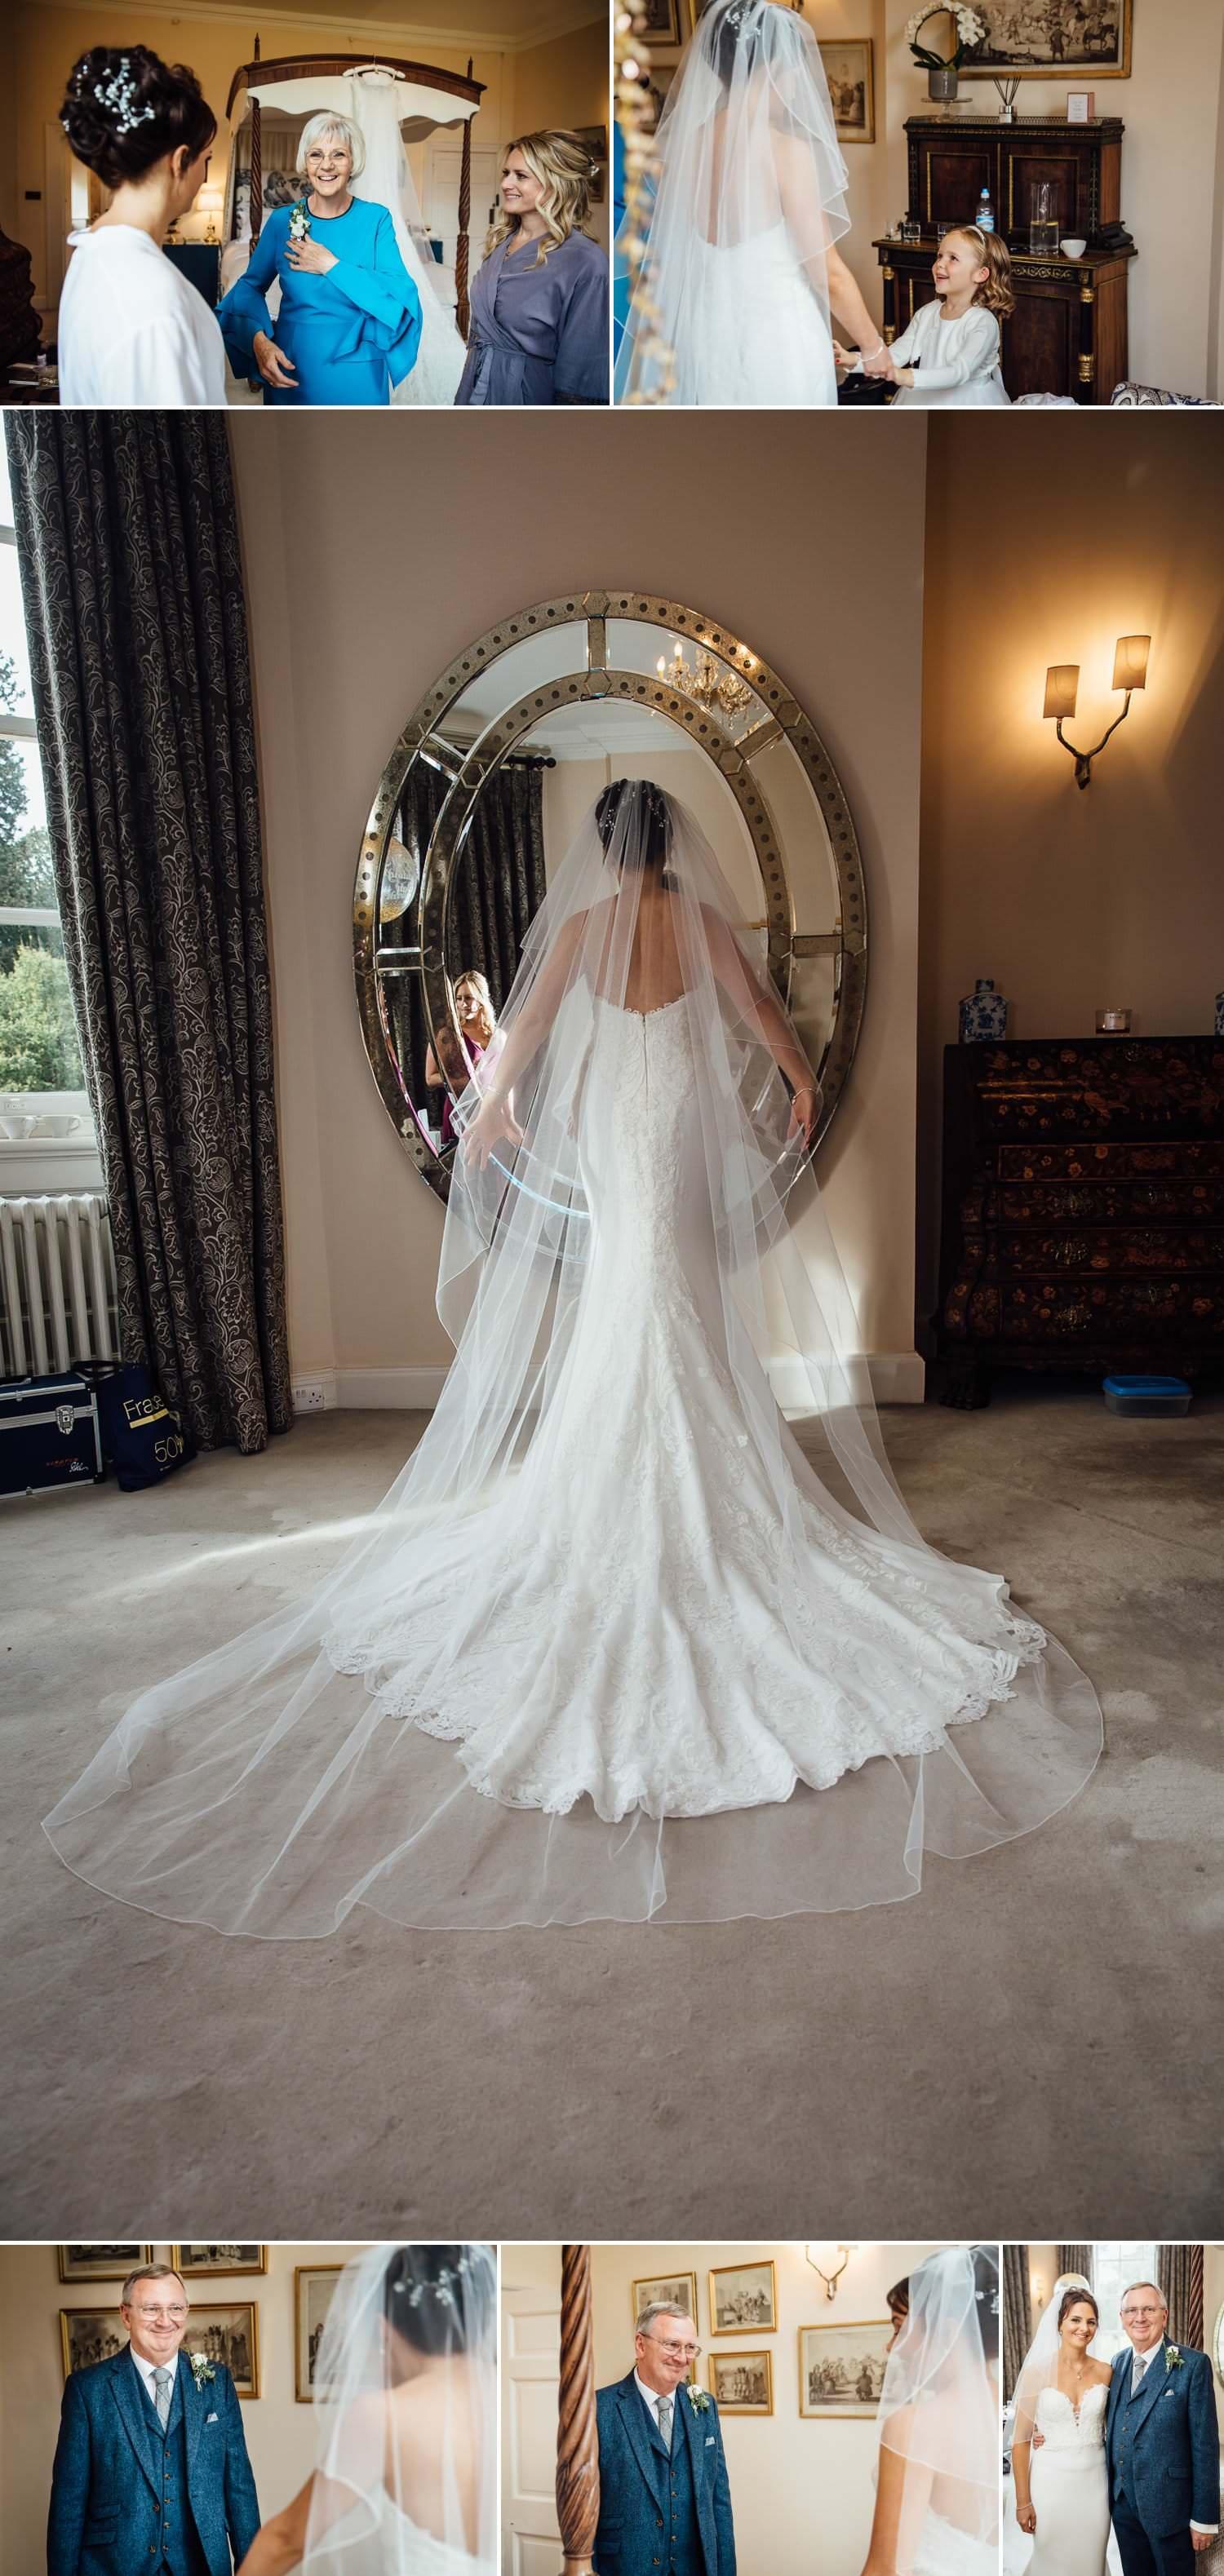 Iscoyd Park back of wedding dress in mirror